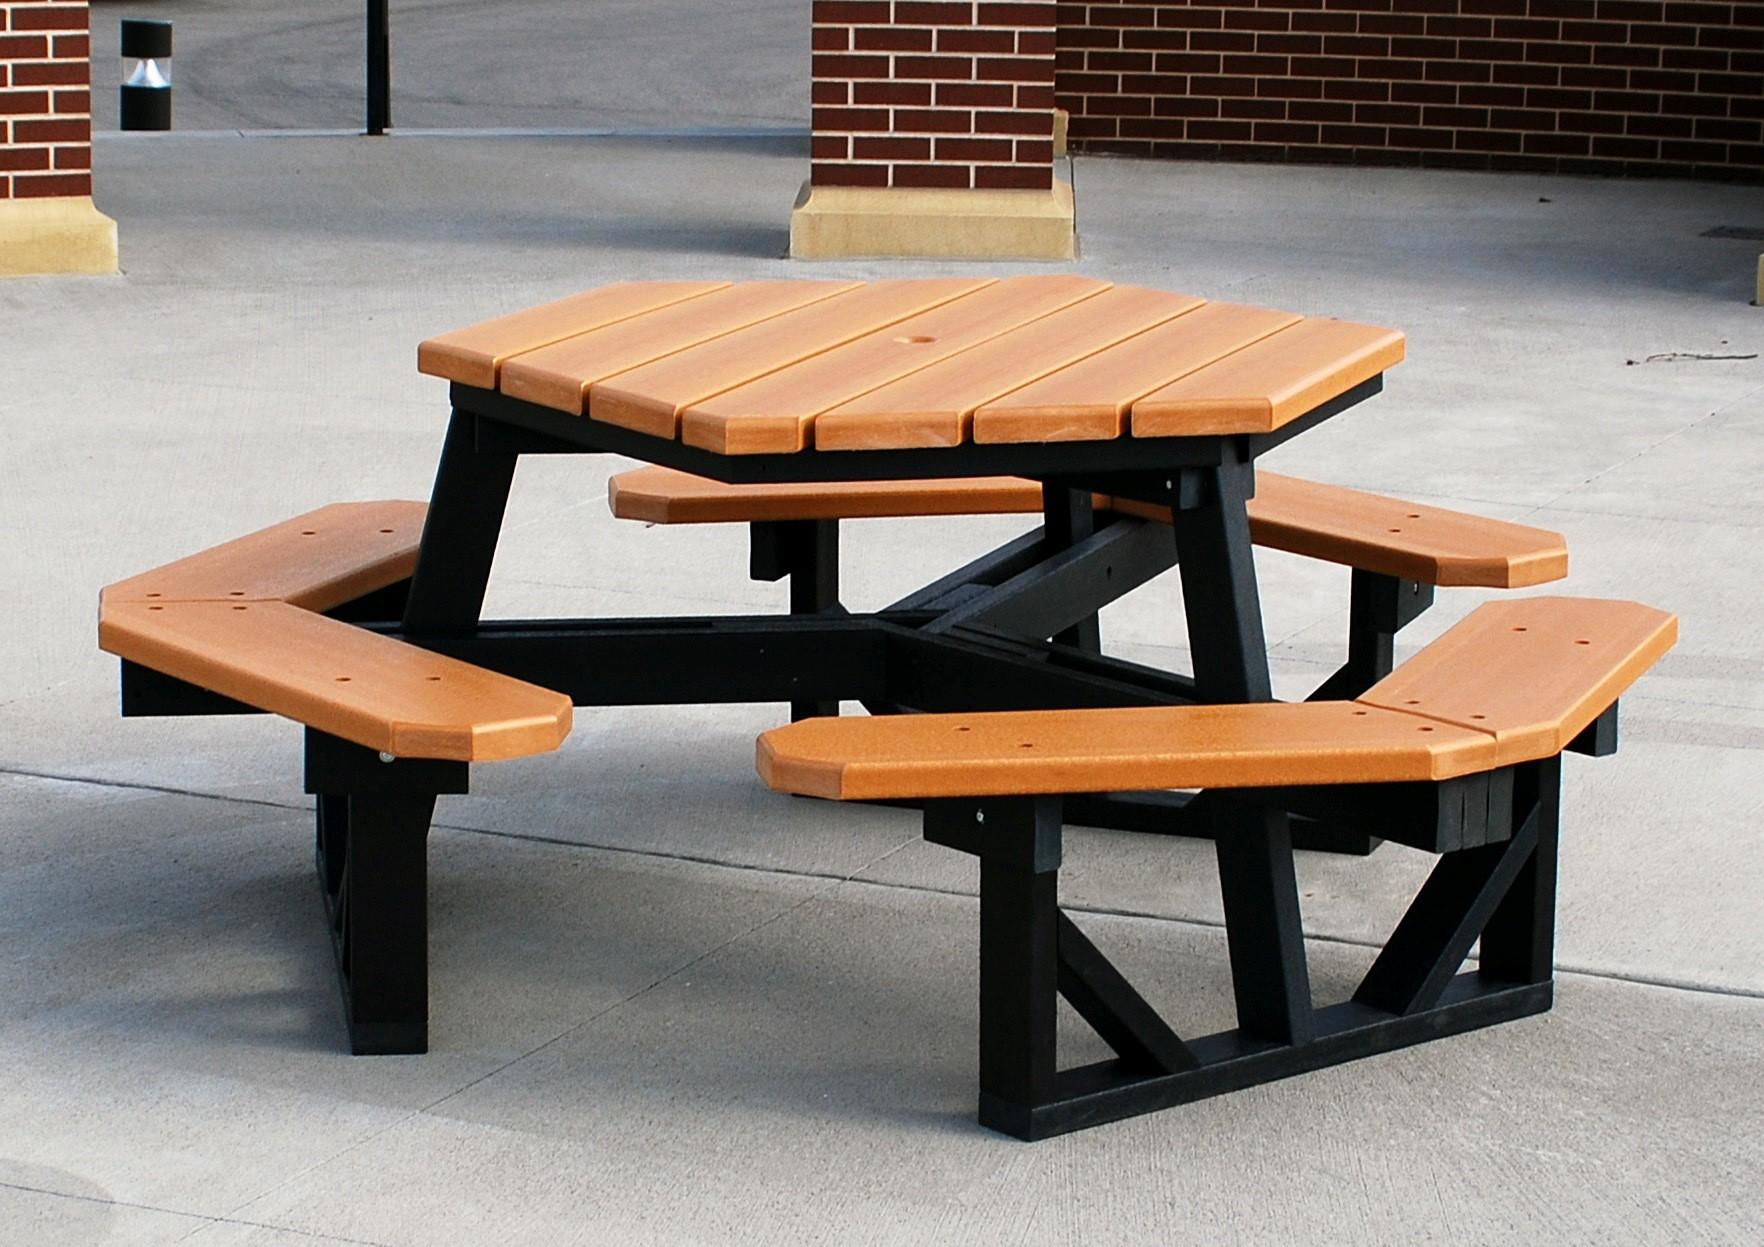 HDPE Hexagon Table - Hexagon picnic table for sale